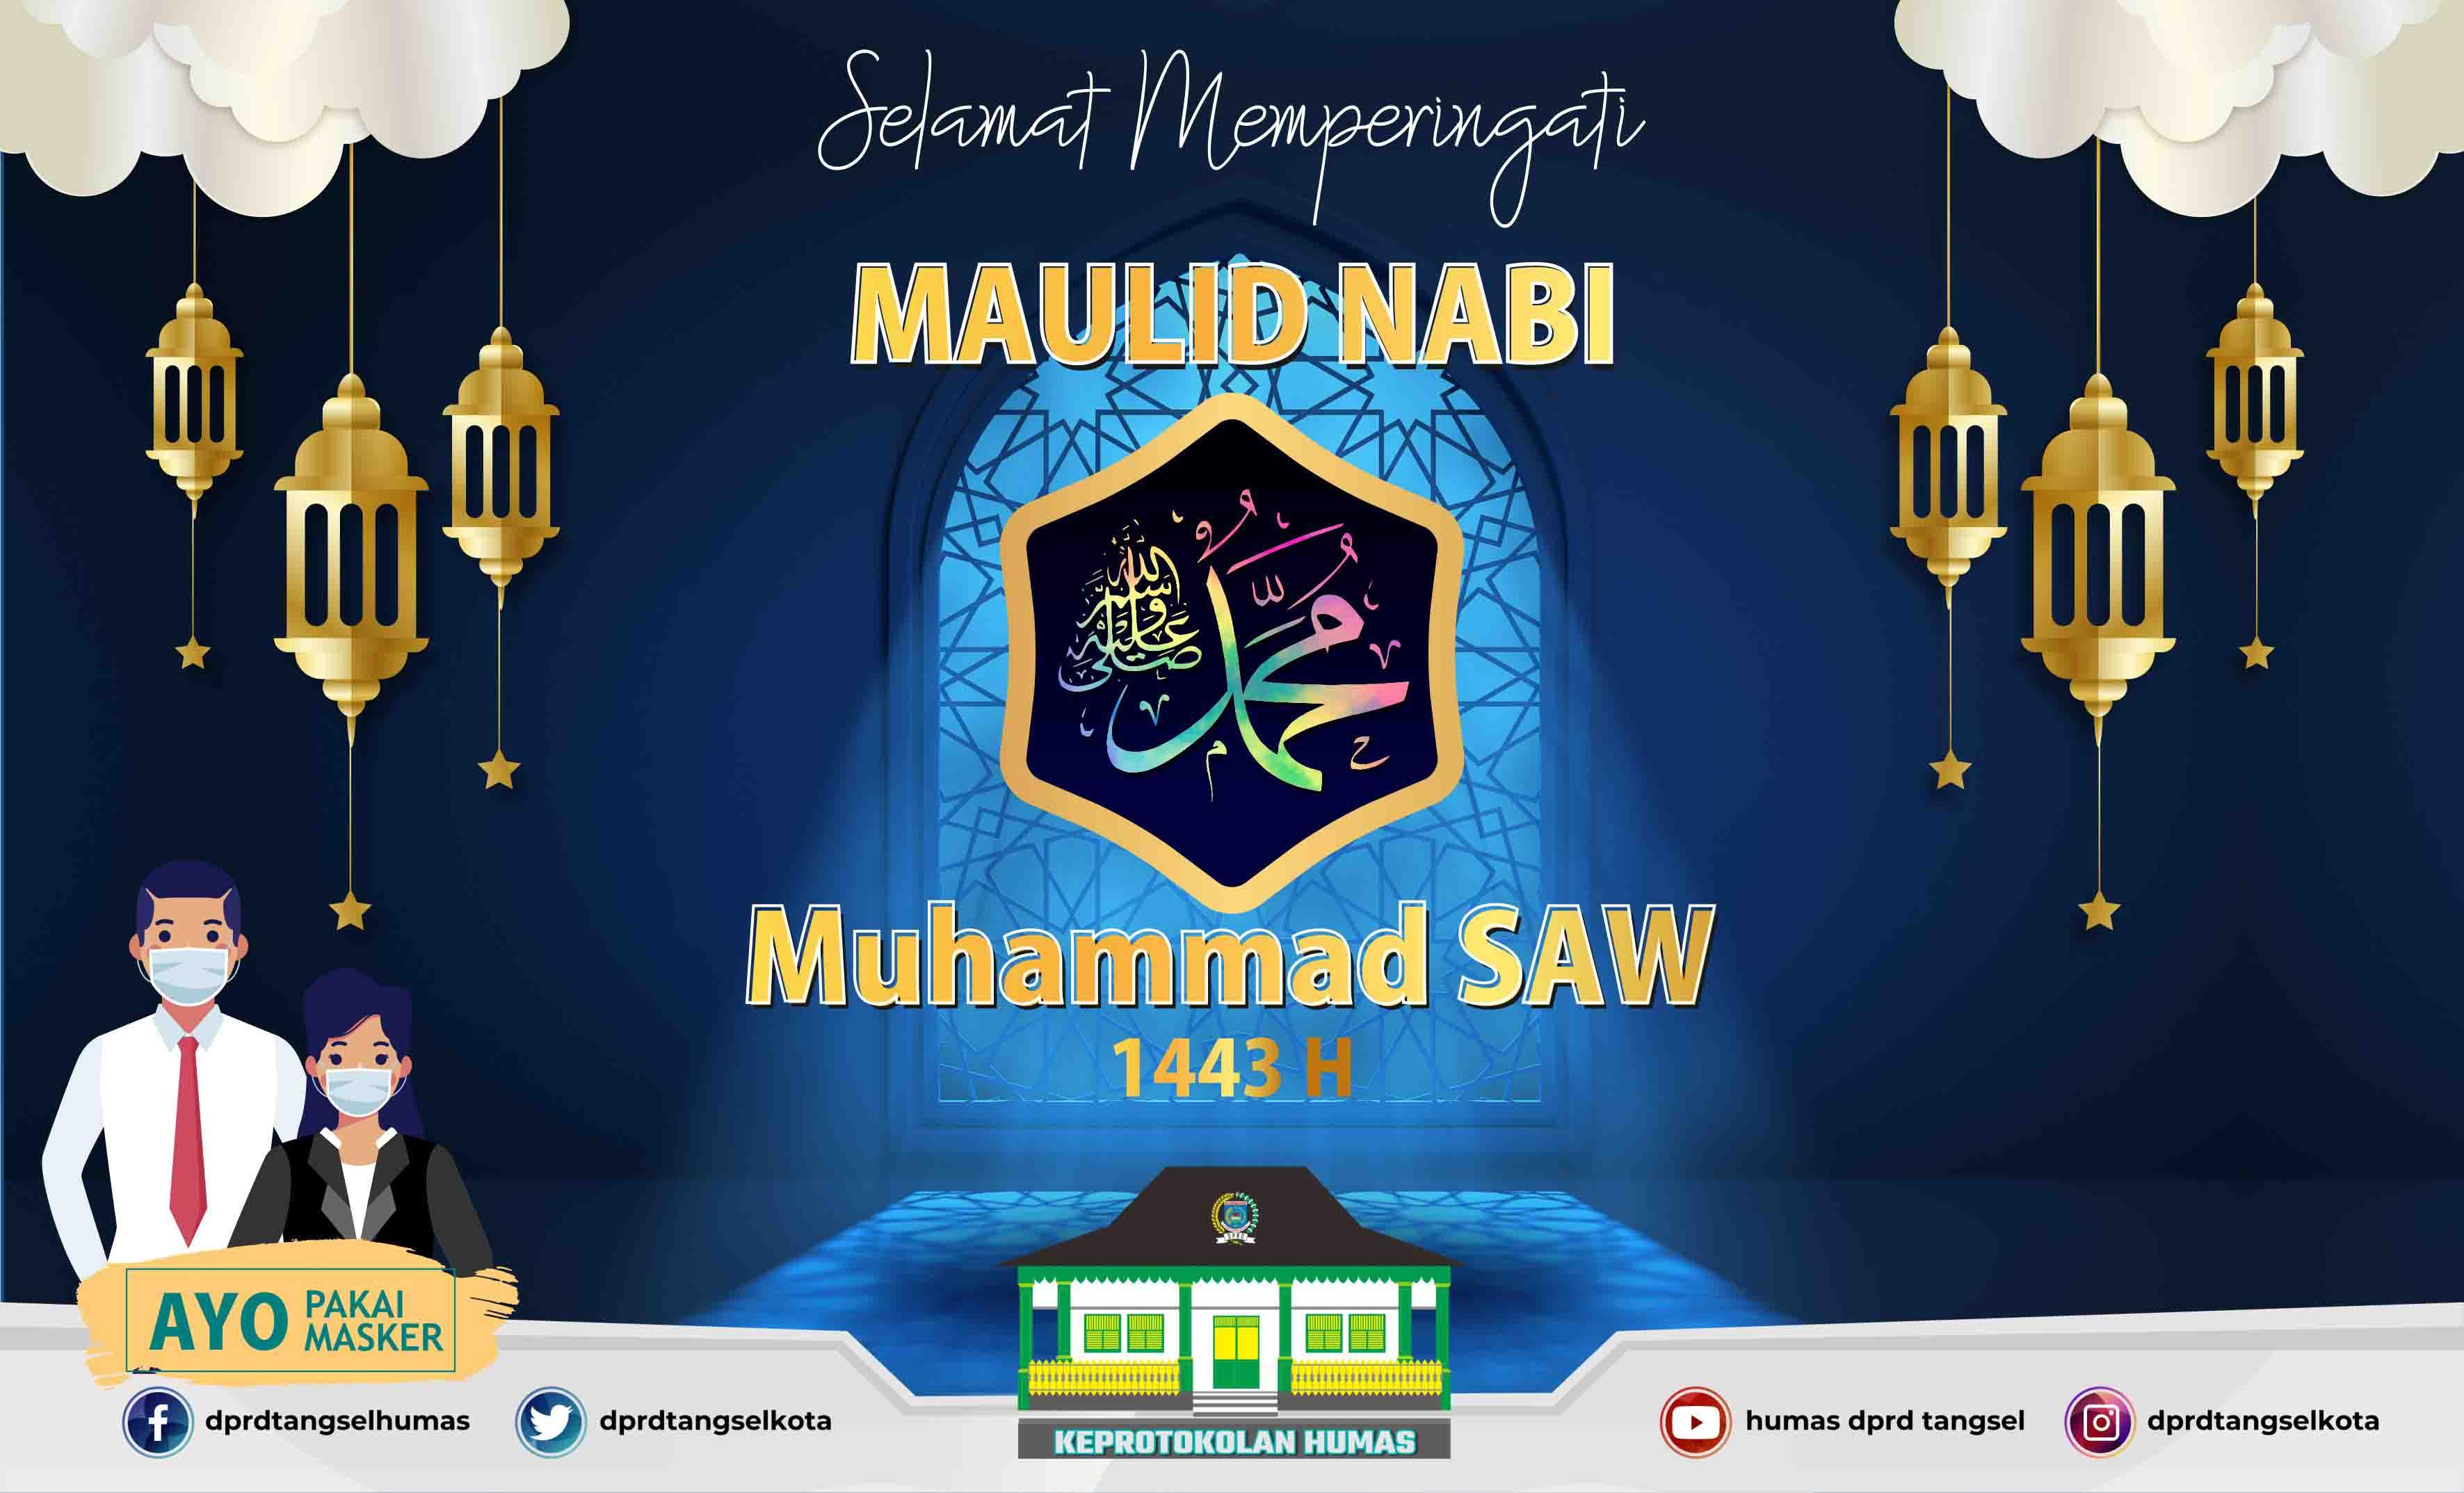 Selamat Memperingati Maulid Nabi Muhammad SAW 1443H